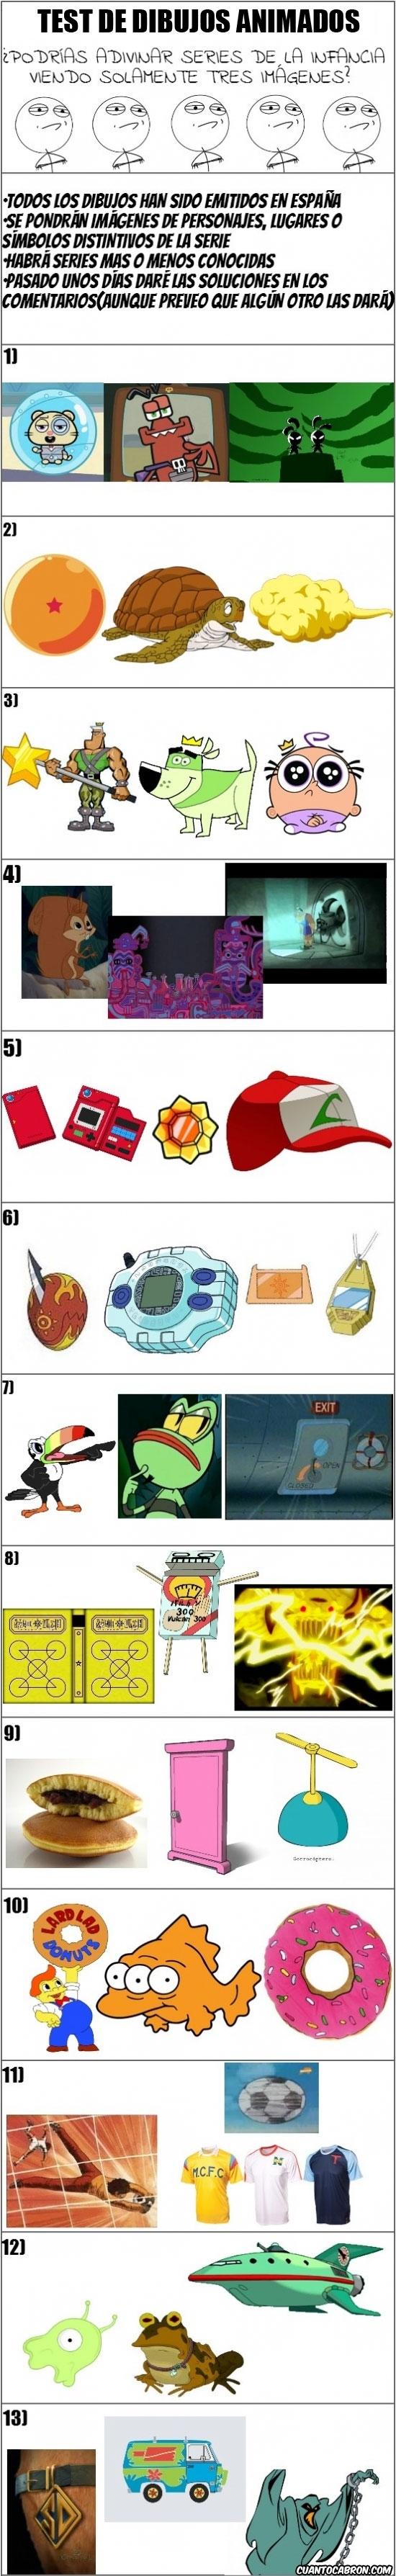 Challenge_accepted - Test de dibujos animagos